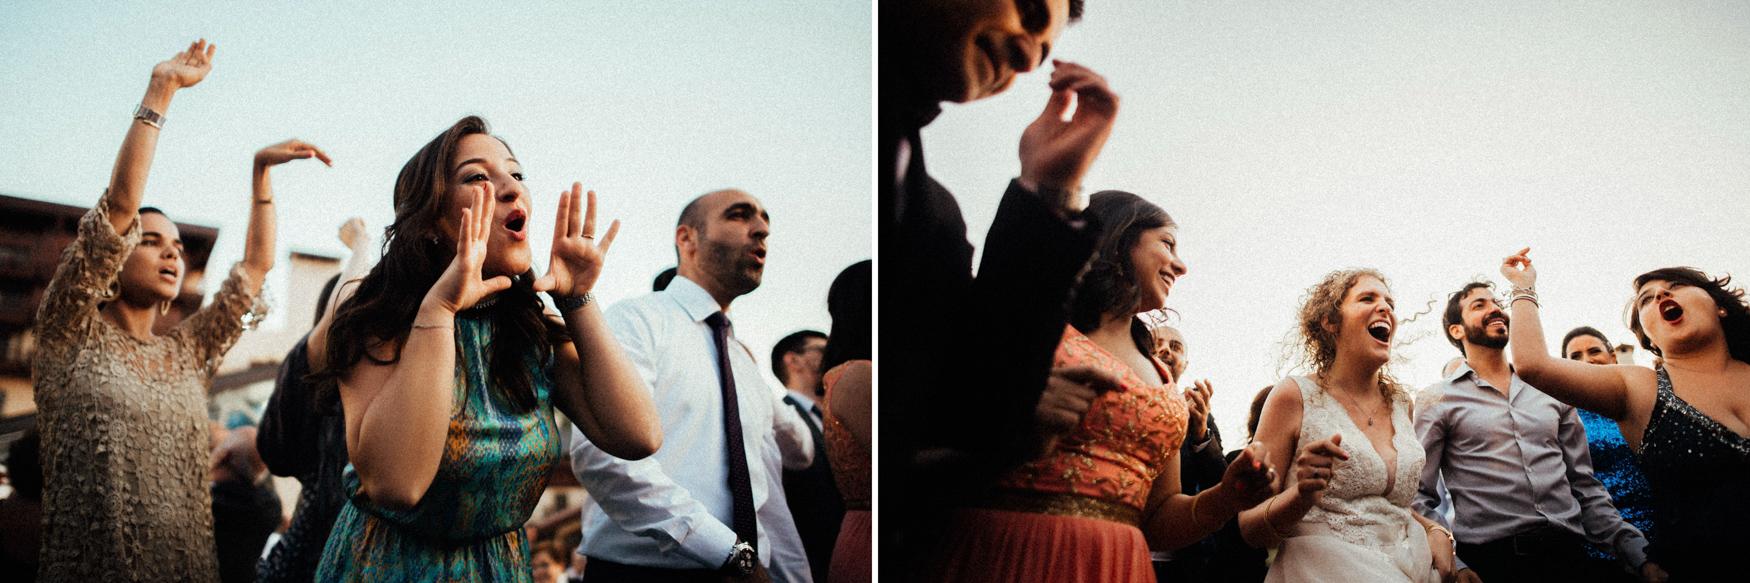 LR5 beirut lebanon mzaar intercontinental wedding photographer 026.jpg